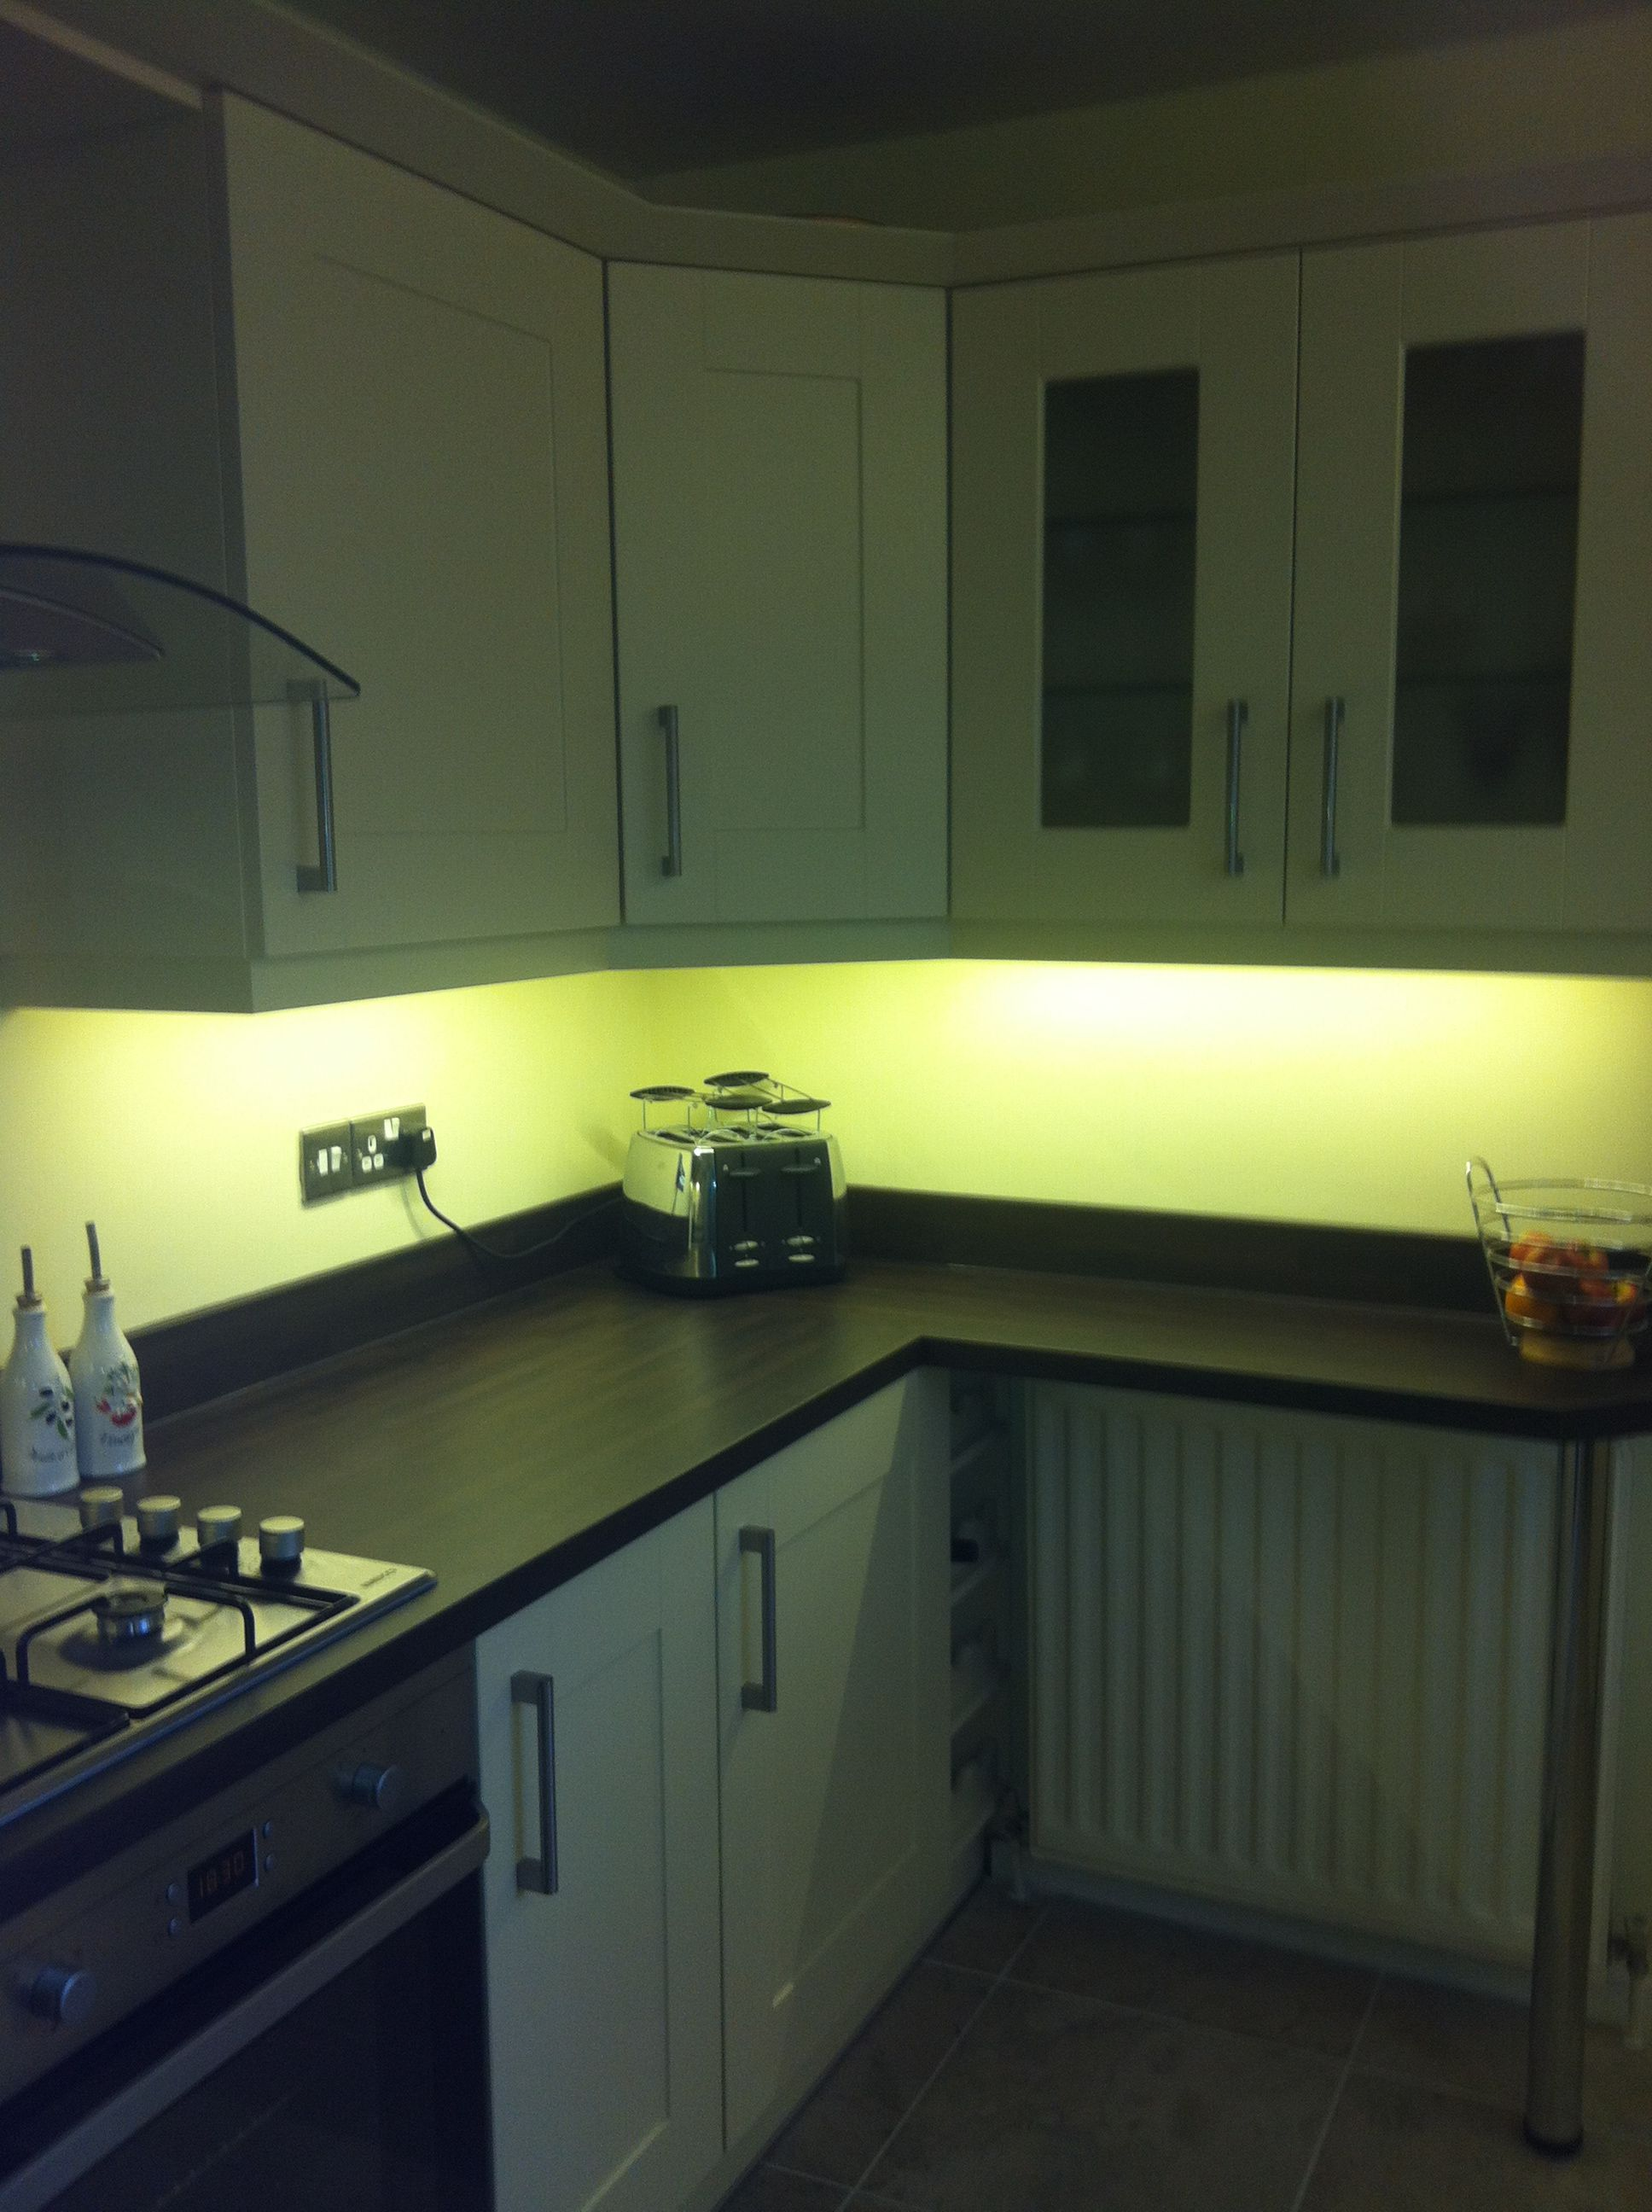 LED strip lights for under cupboard kitchen lights in warm ...